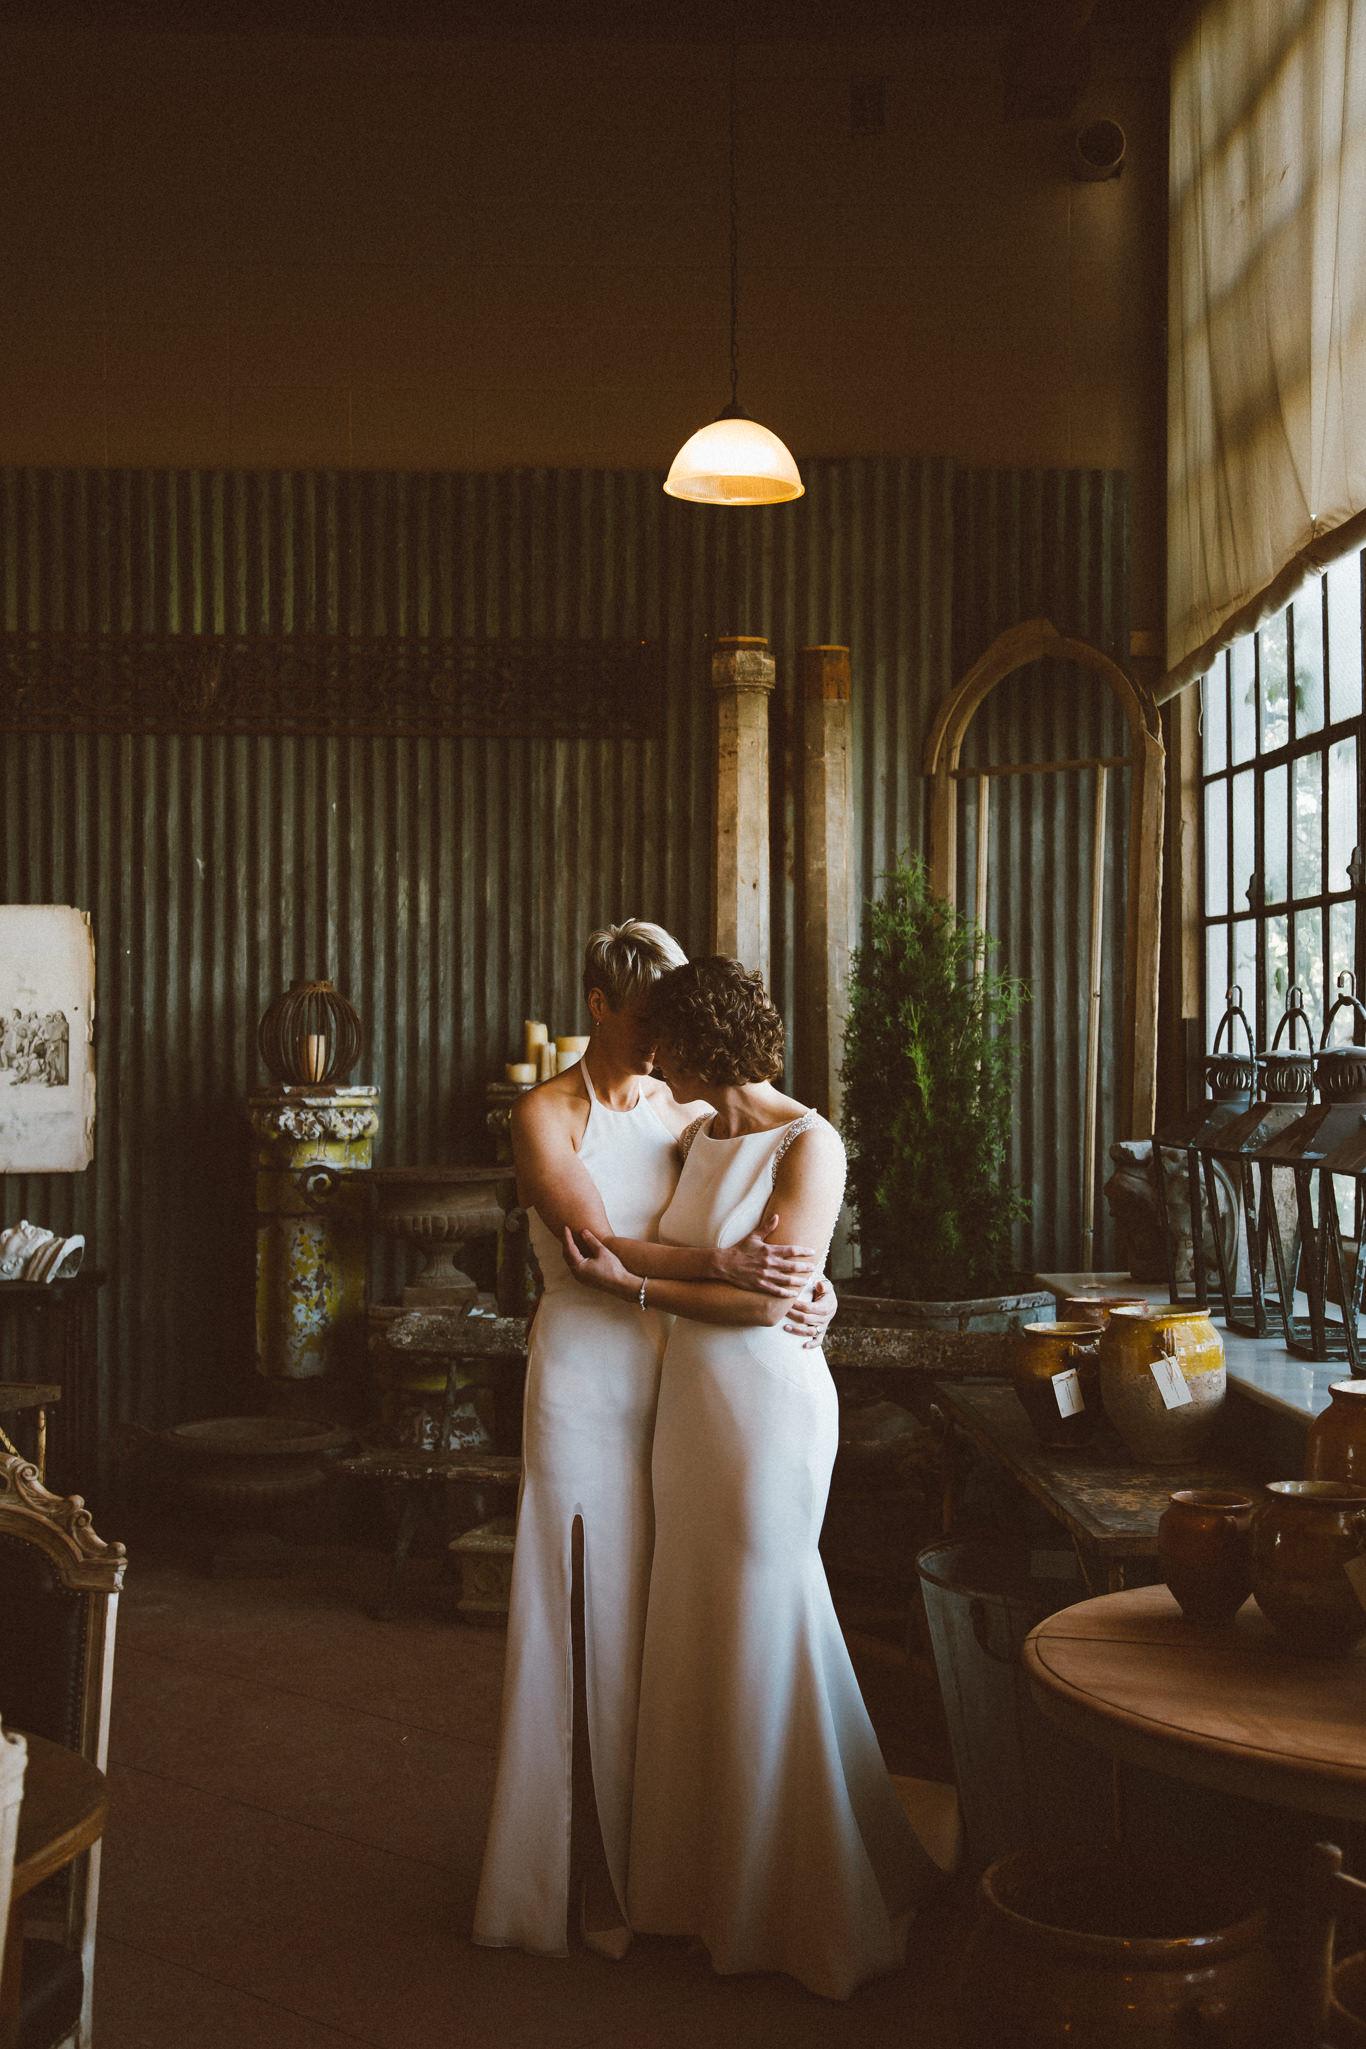 Lindsay-and-Heather-Charbar-Restaurant-Wedding-in-Calgary-19